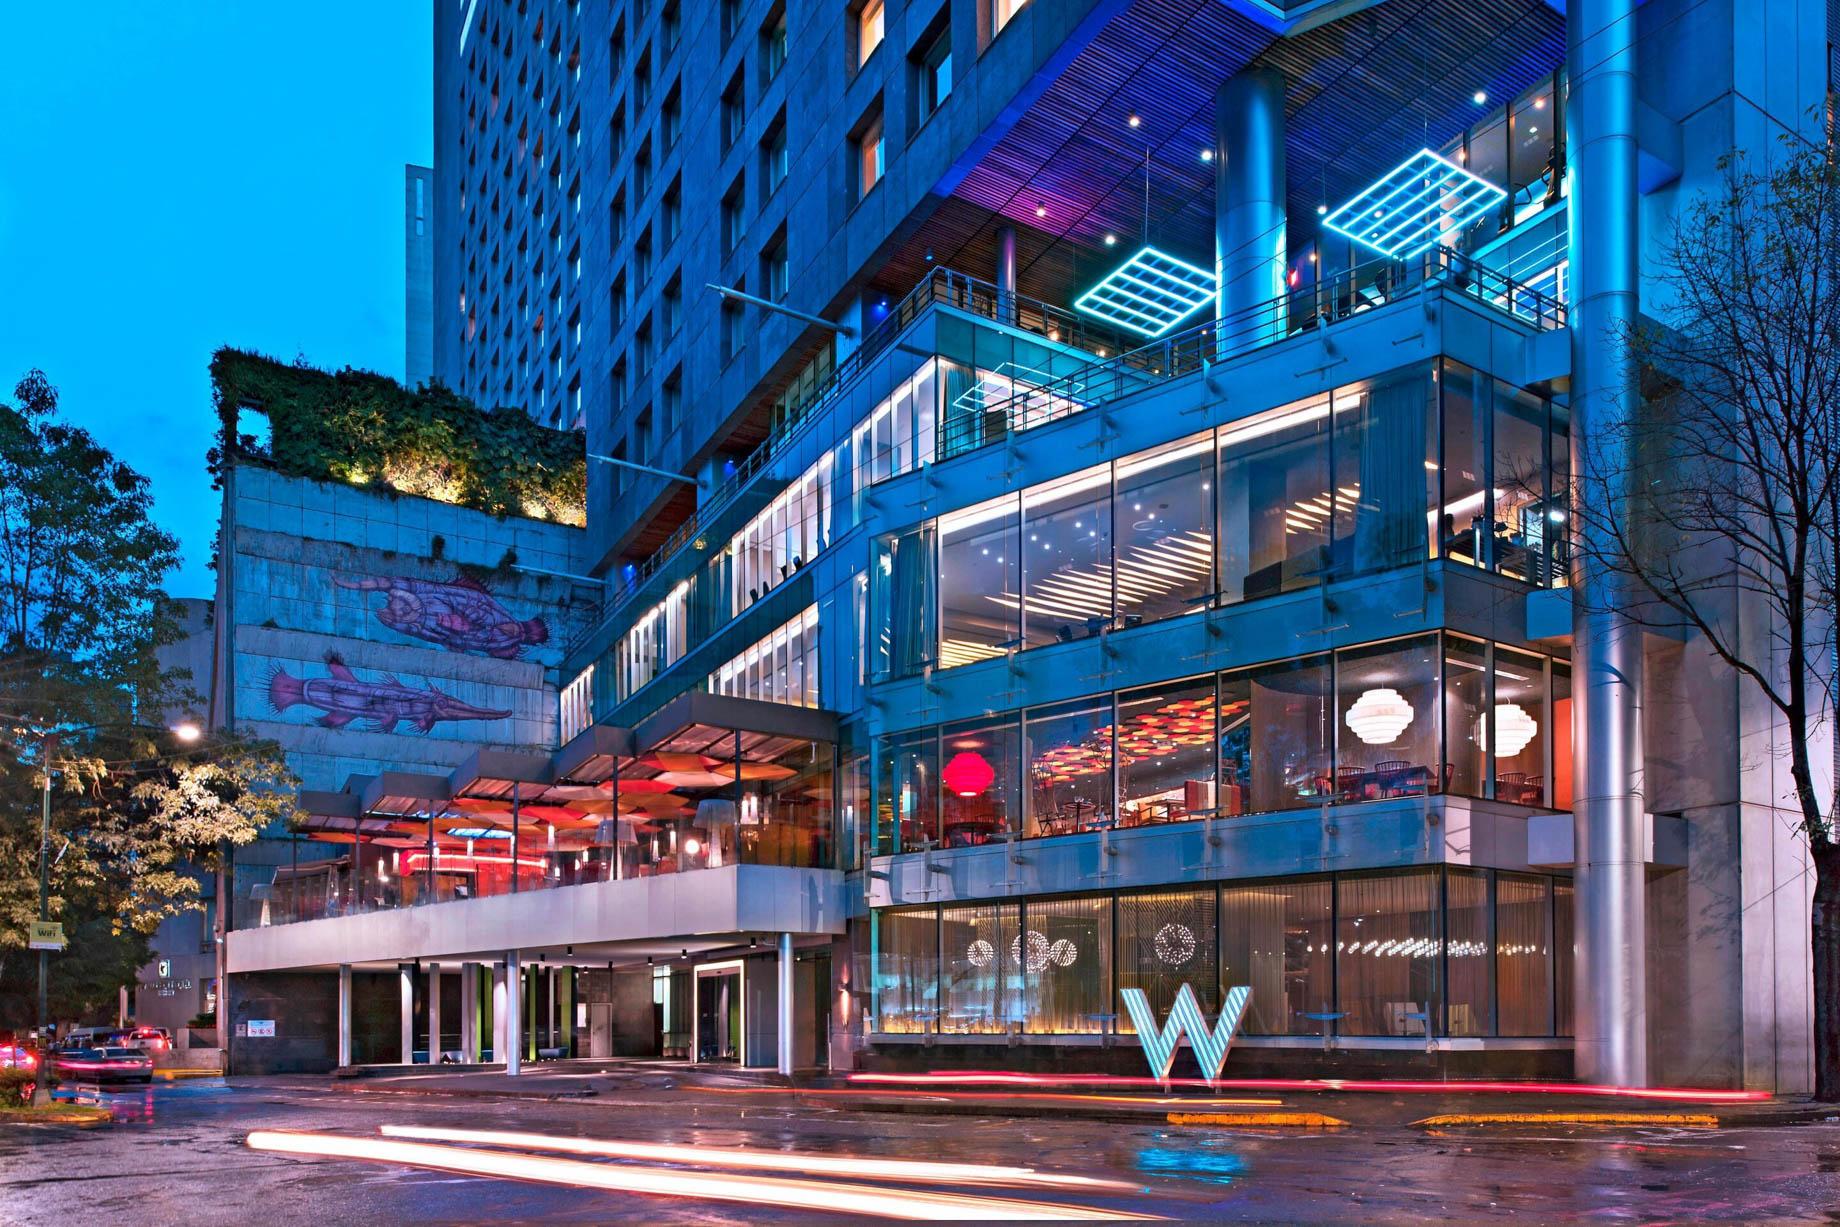 W Mexico City Luxury Hotel - Polanco, Mexico City, Mexico - W Hotel Exterior